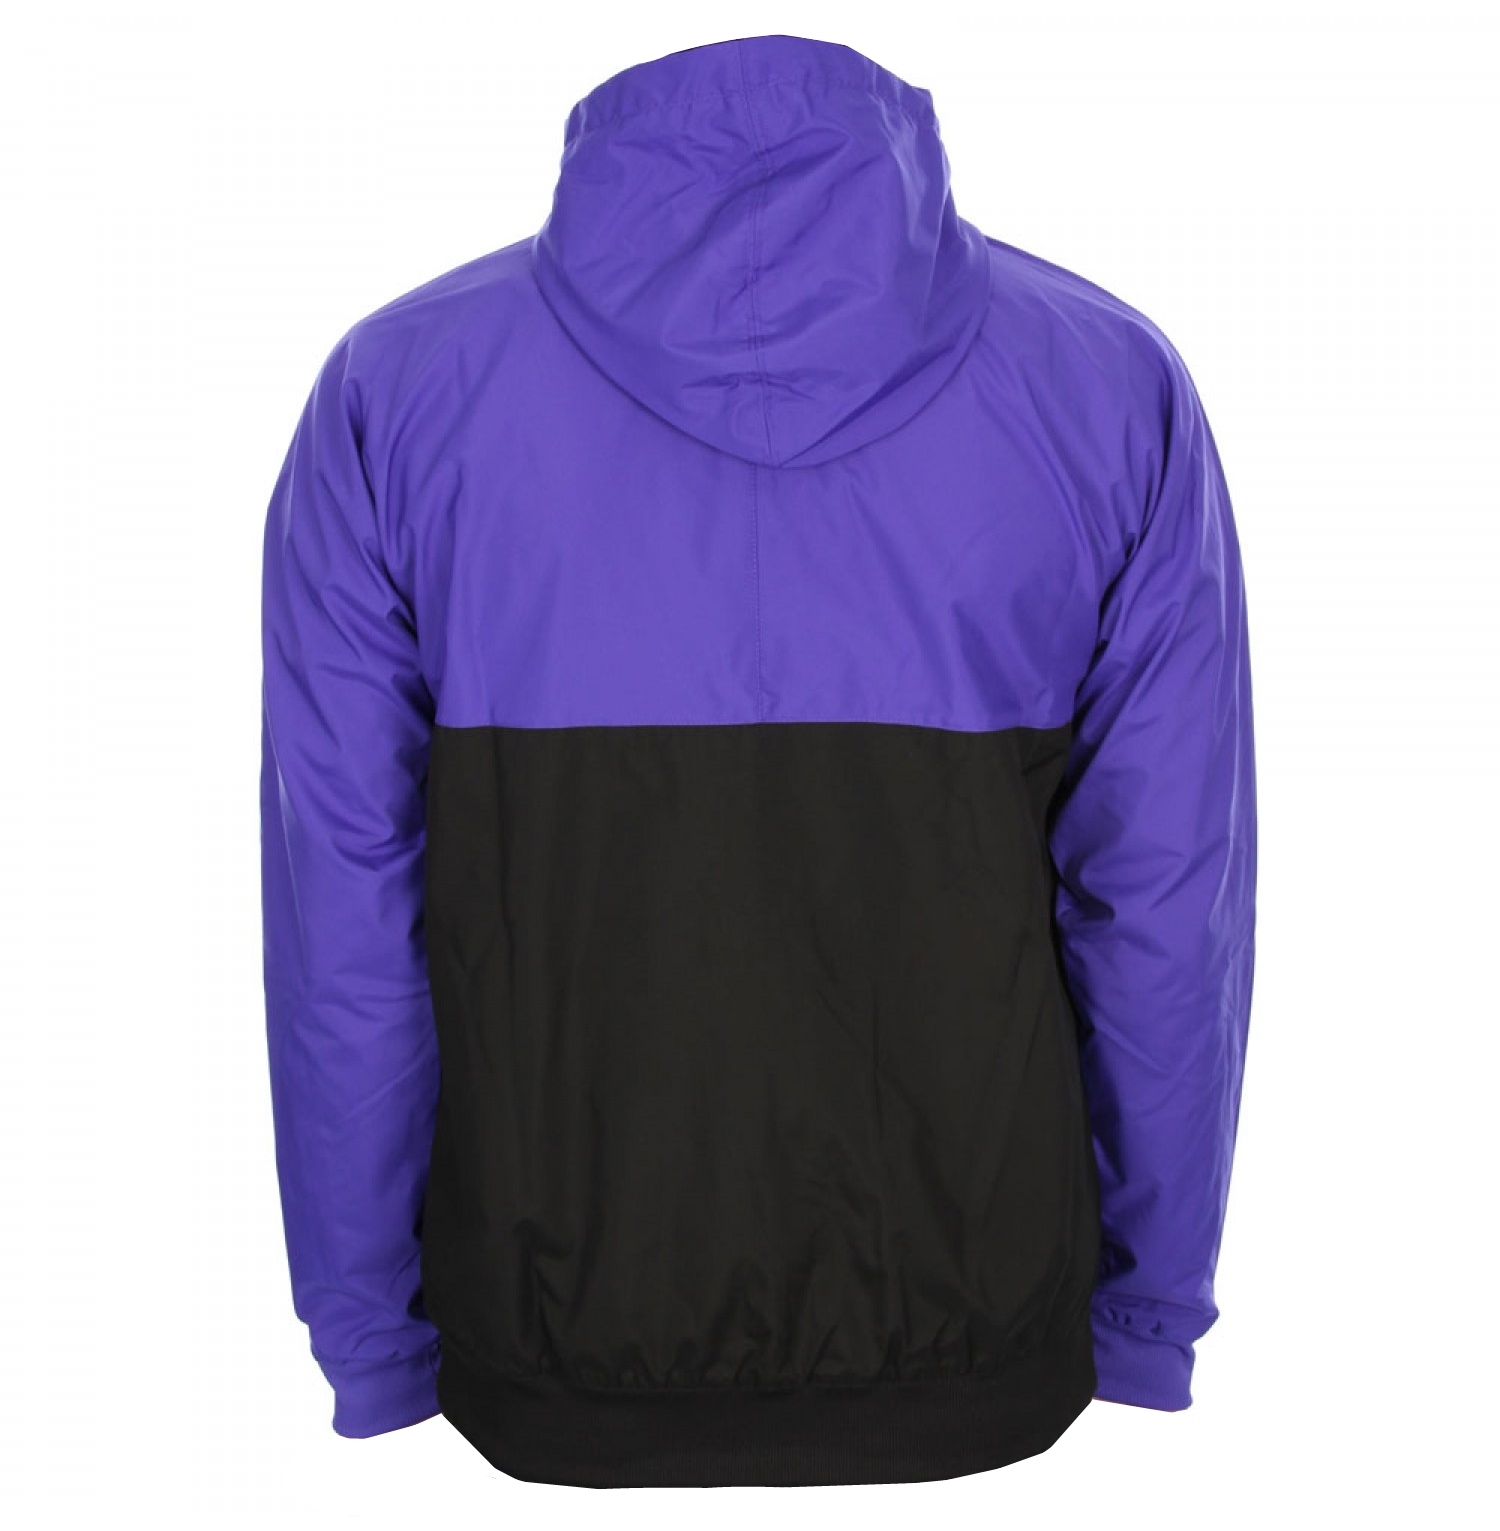 adidas Originals Apparel Marathon 83 Jacket Purple Black